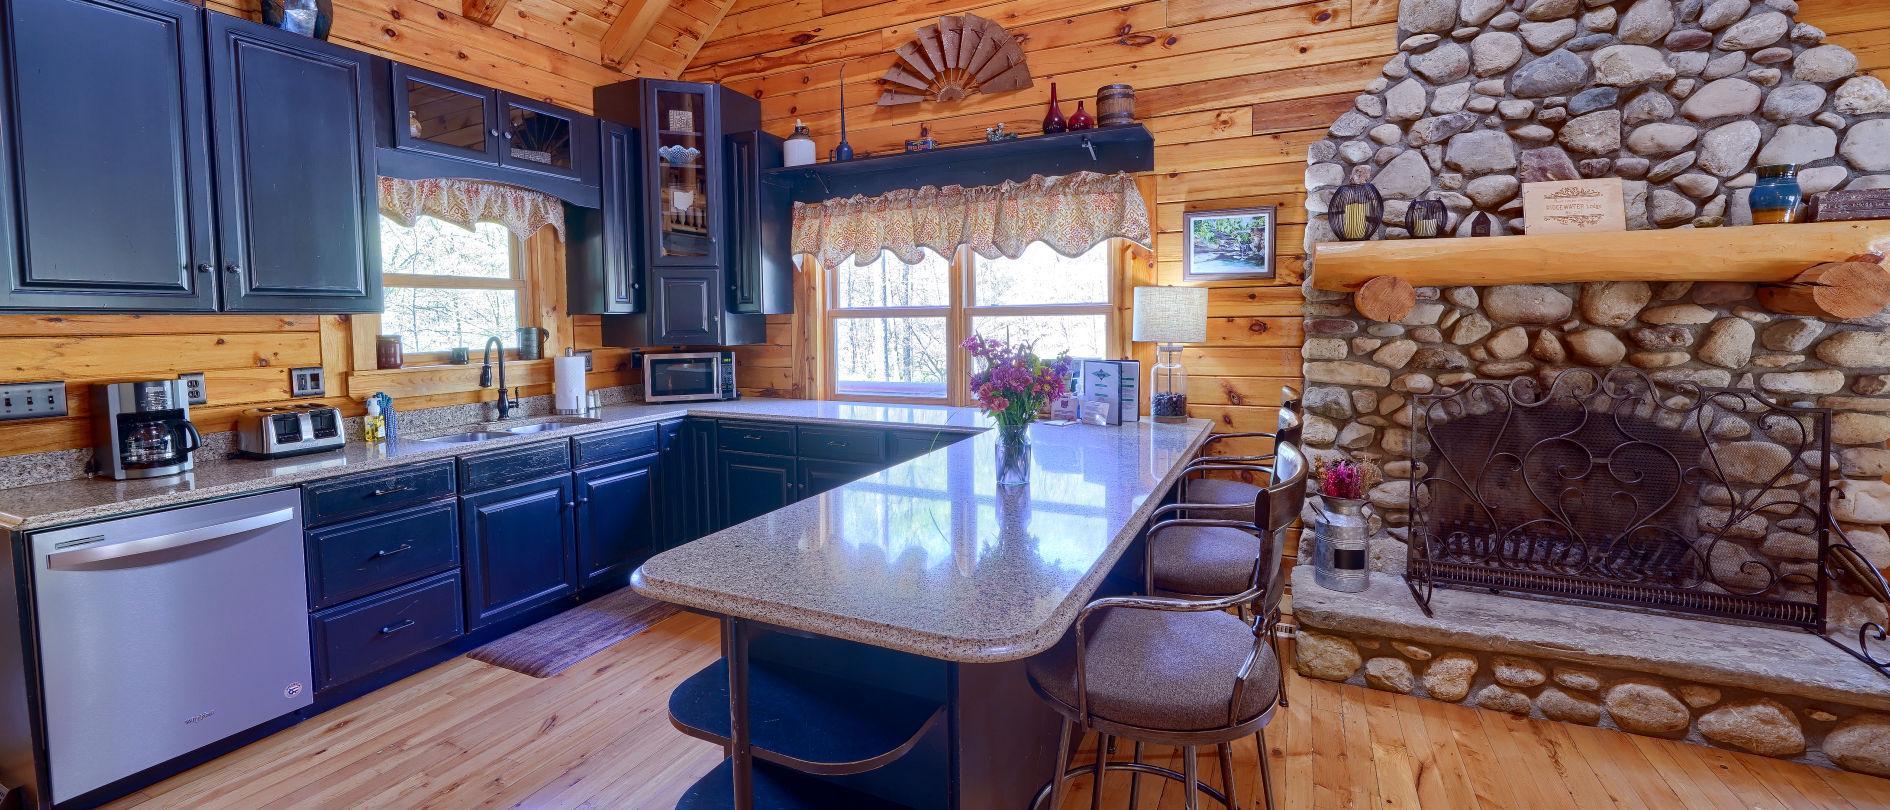 Ridgewater Lodge Hocking hills Kitchen About